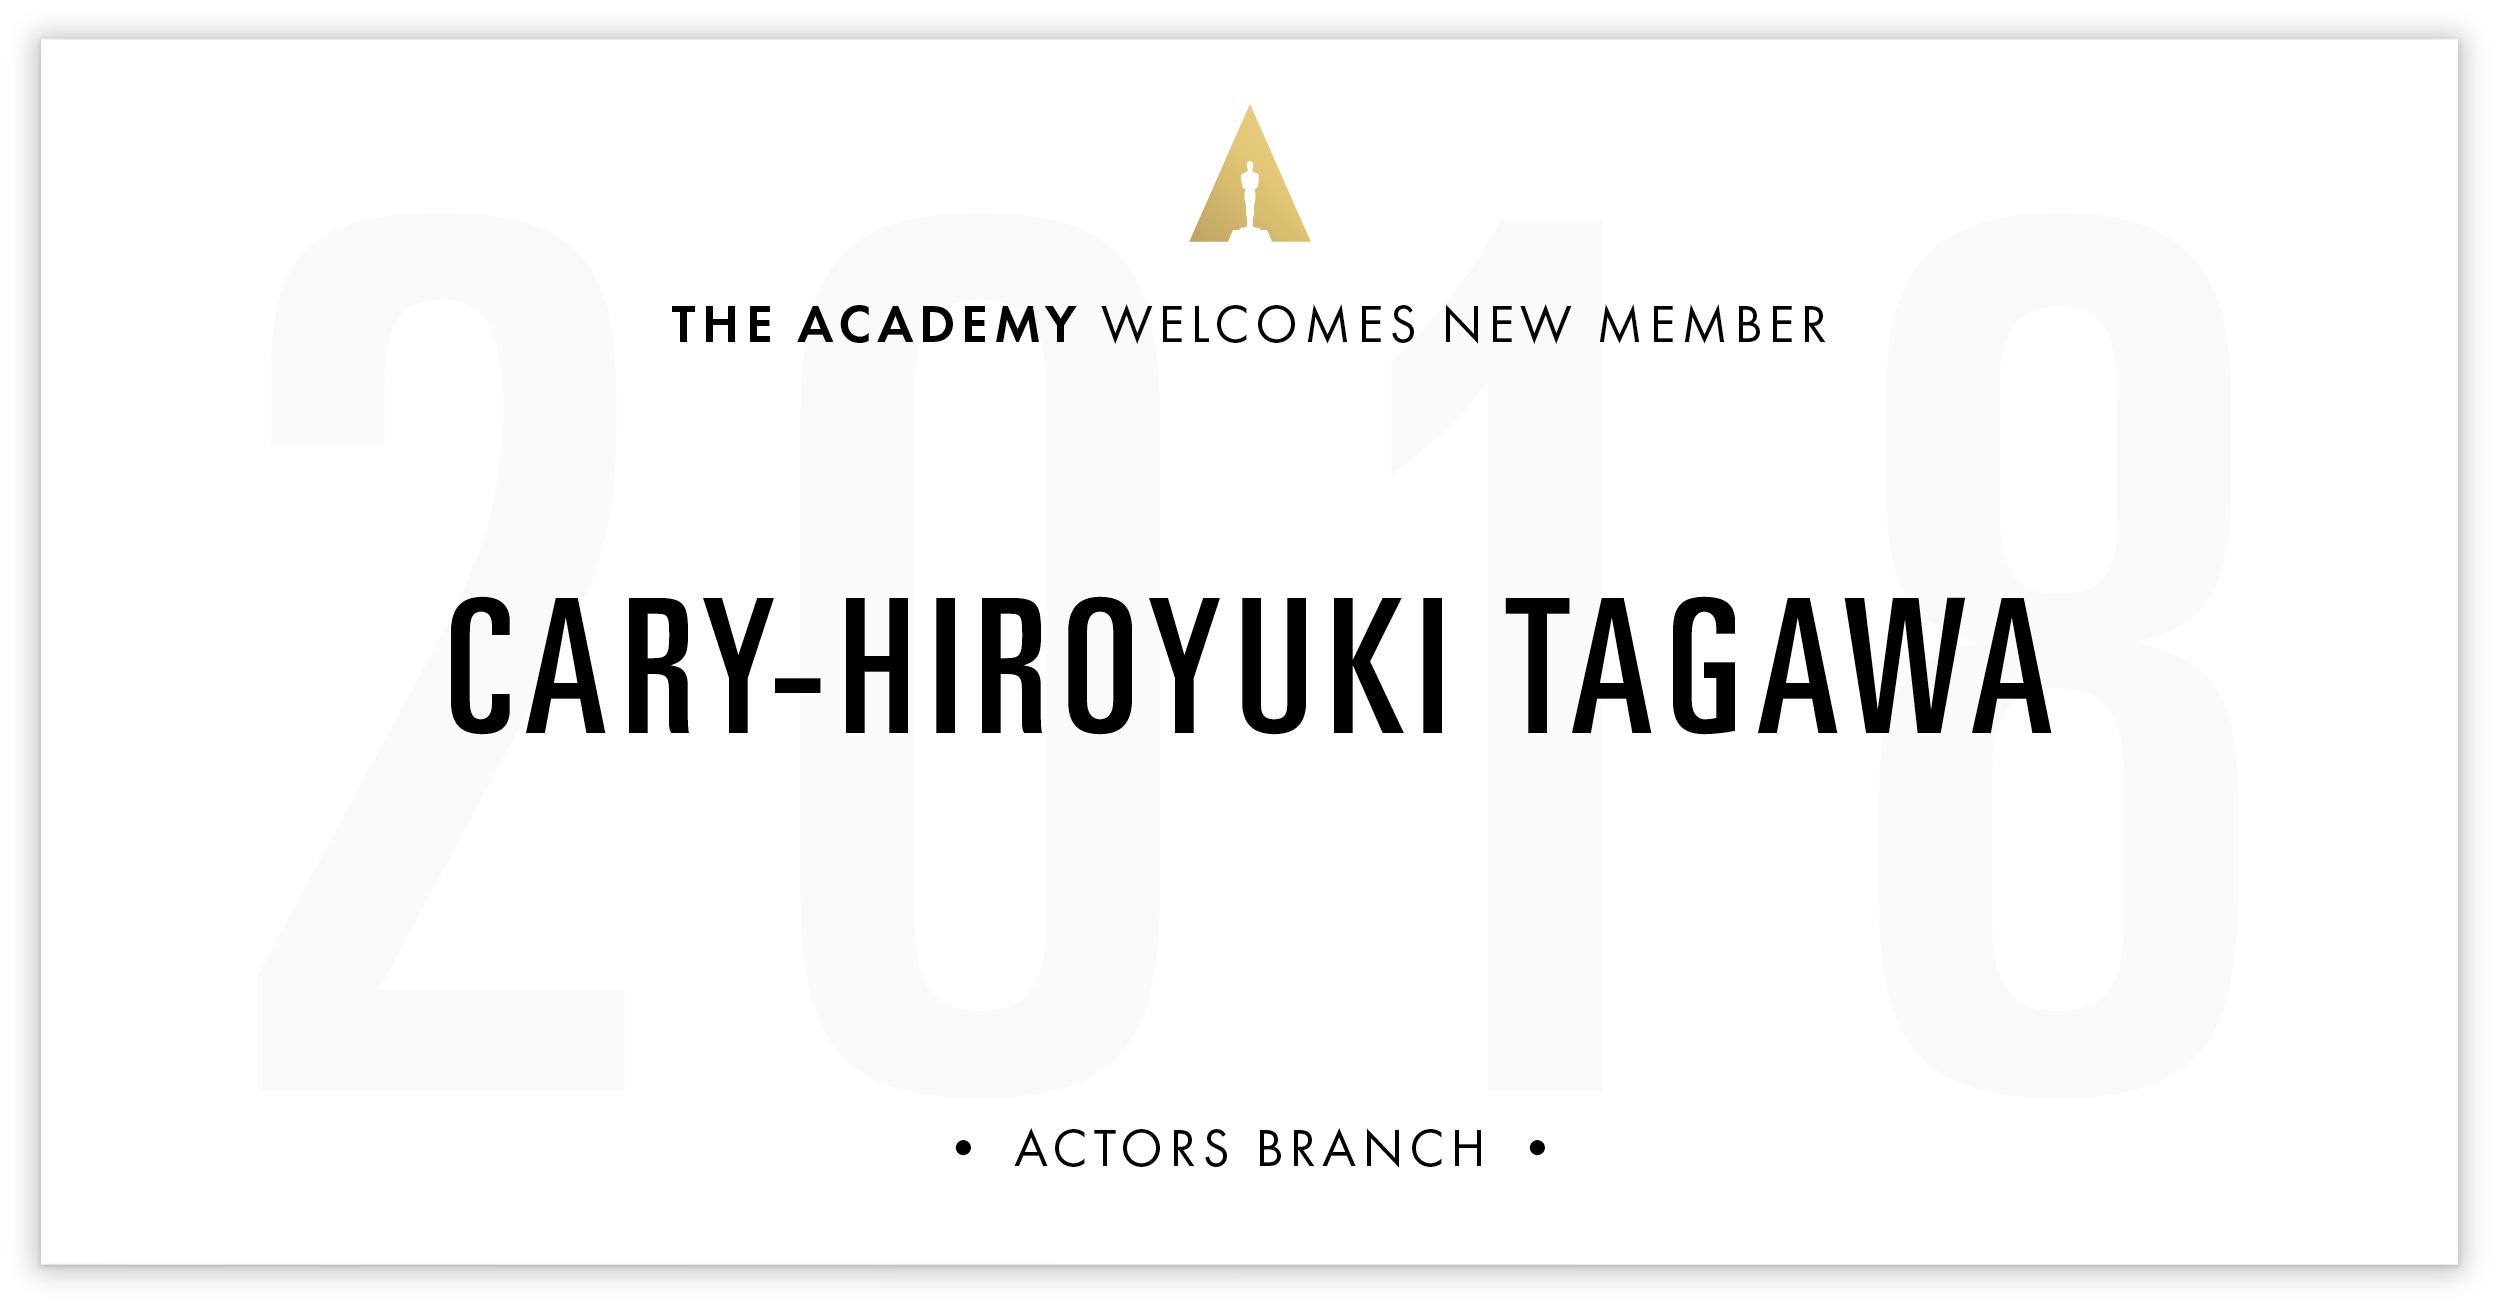 Cary-Hiroyuki Tagawa is invited!